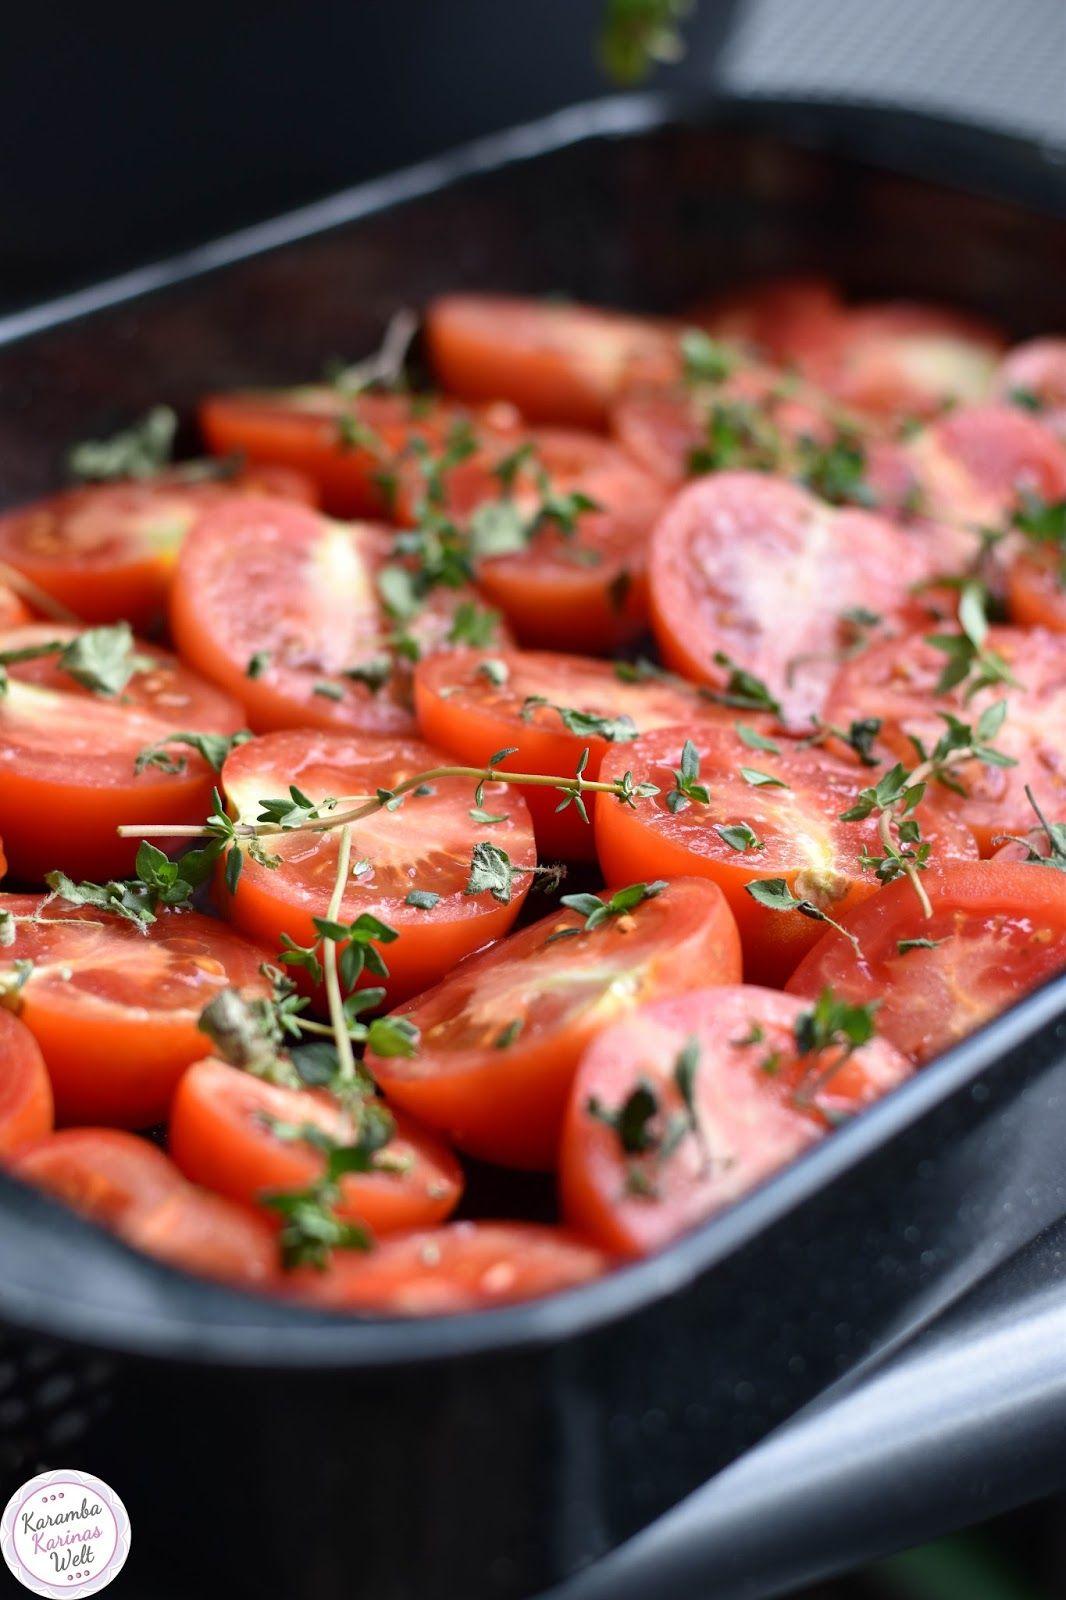 79df794fc7f463e2a1ee9bc7351f8b55 - Rezepte Tomatensoãÿe